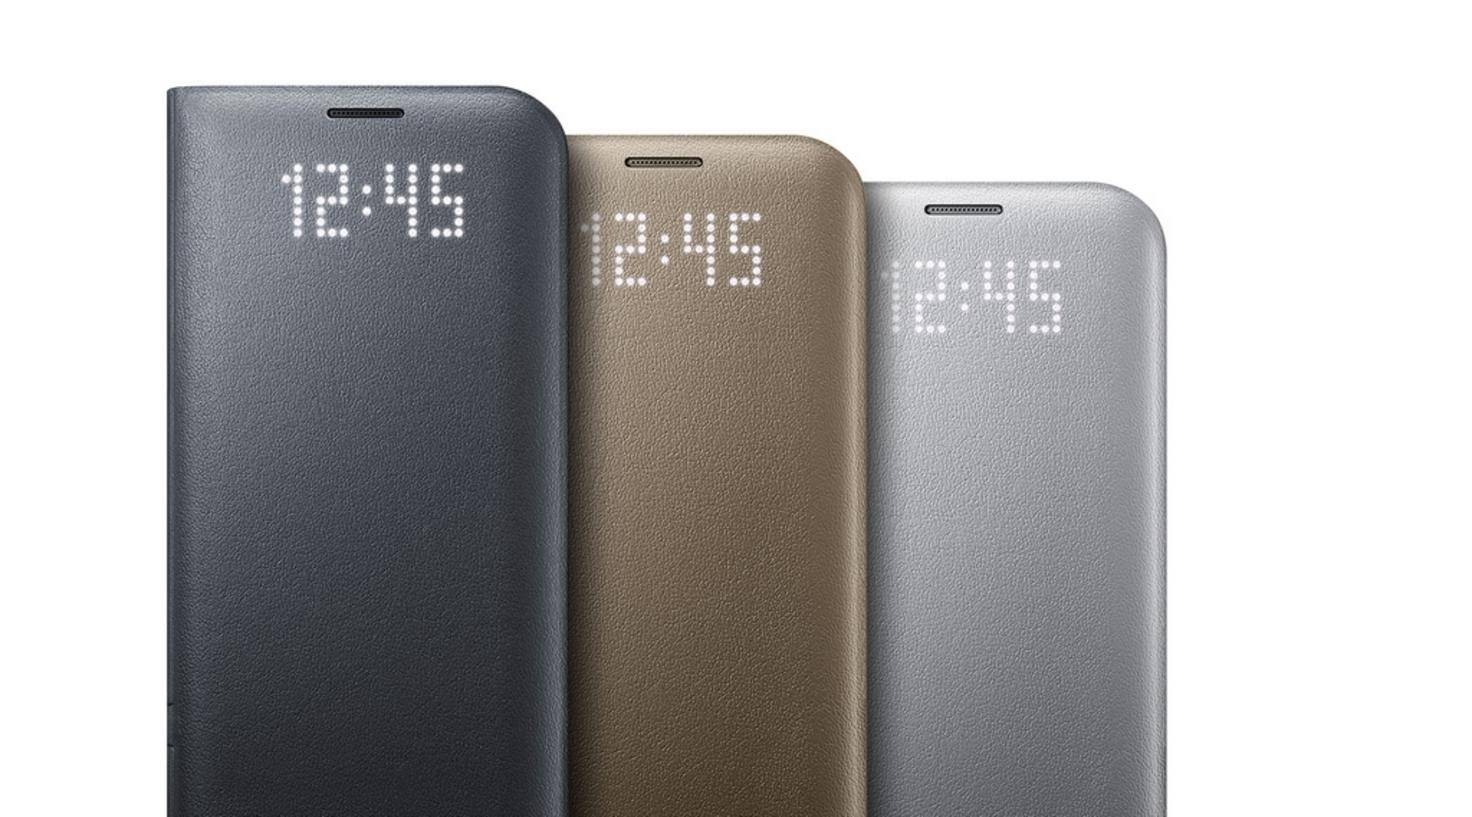 Samsung_Galaxy_S7_LED_View